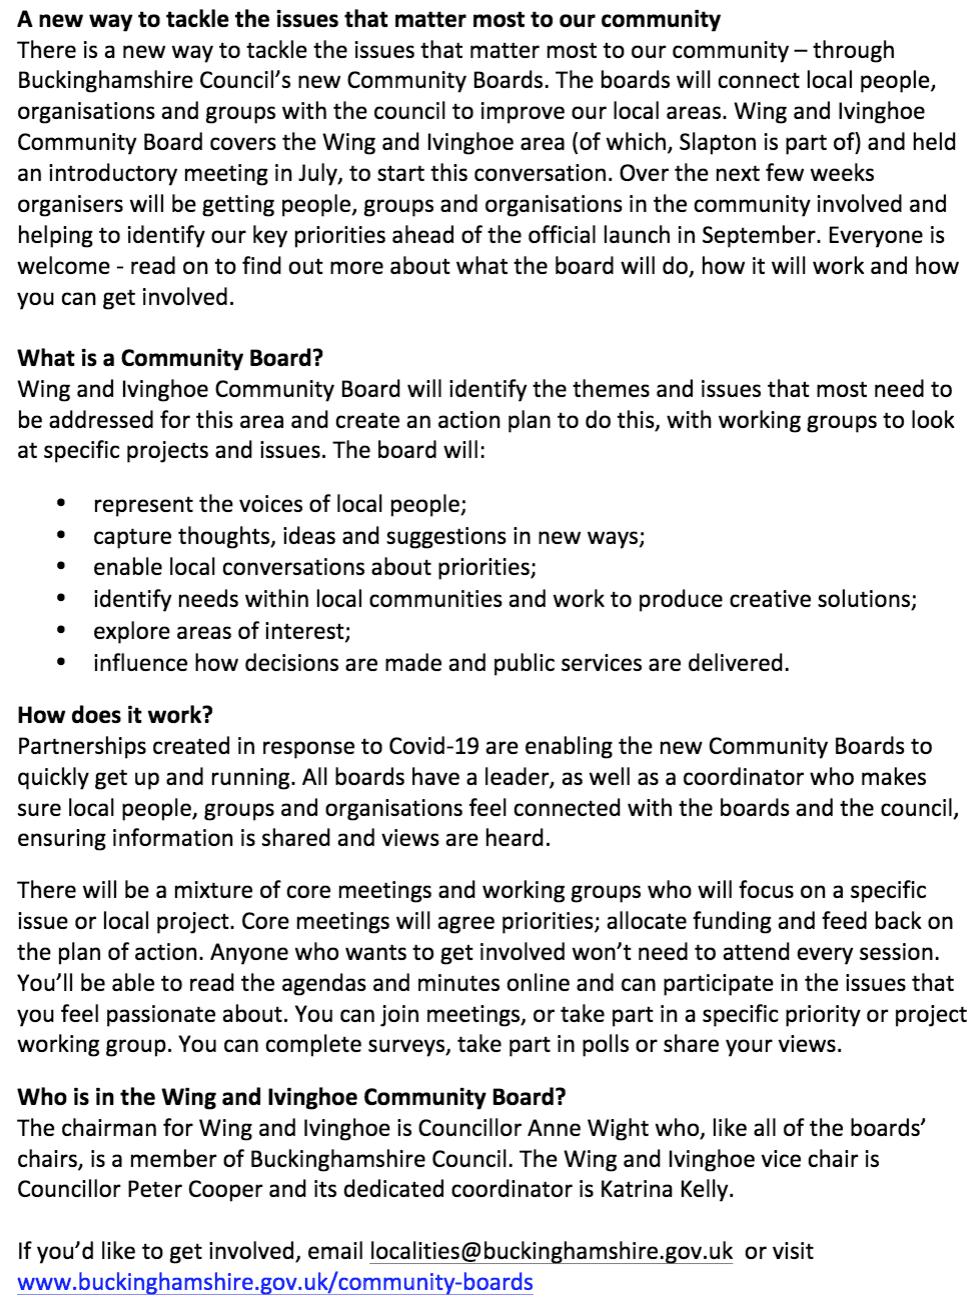 Community Boards